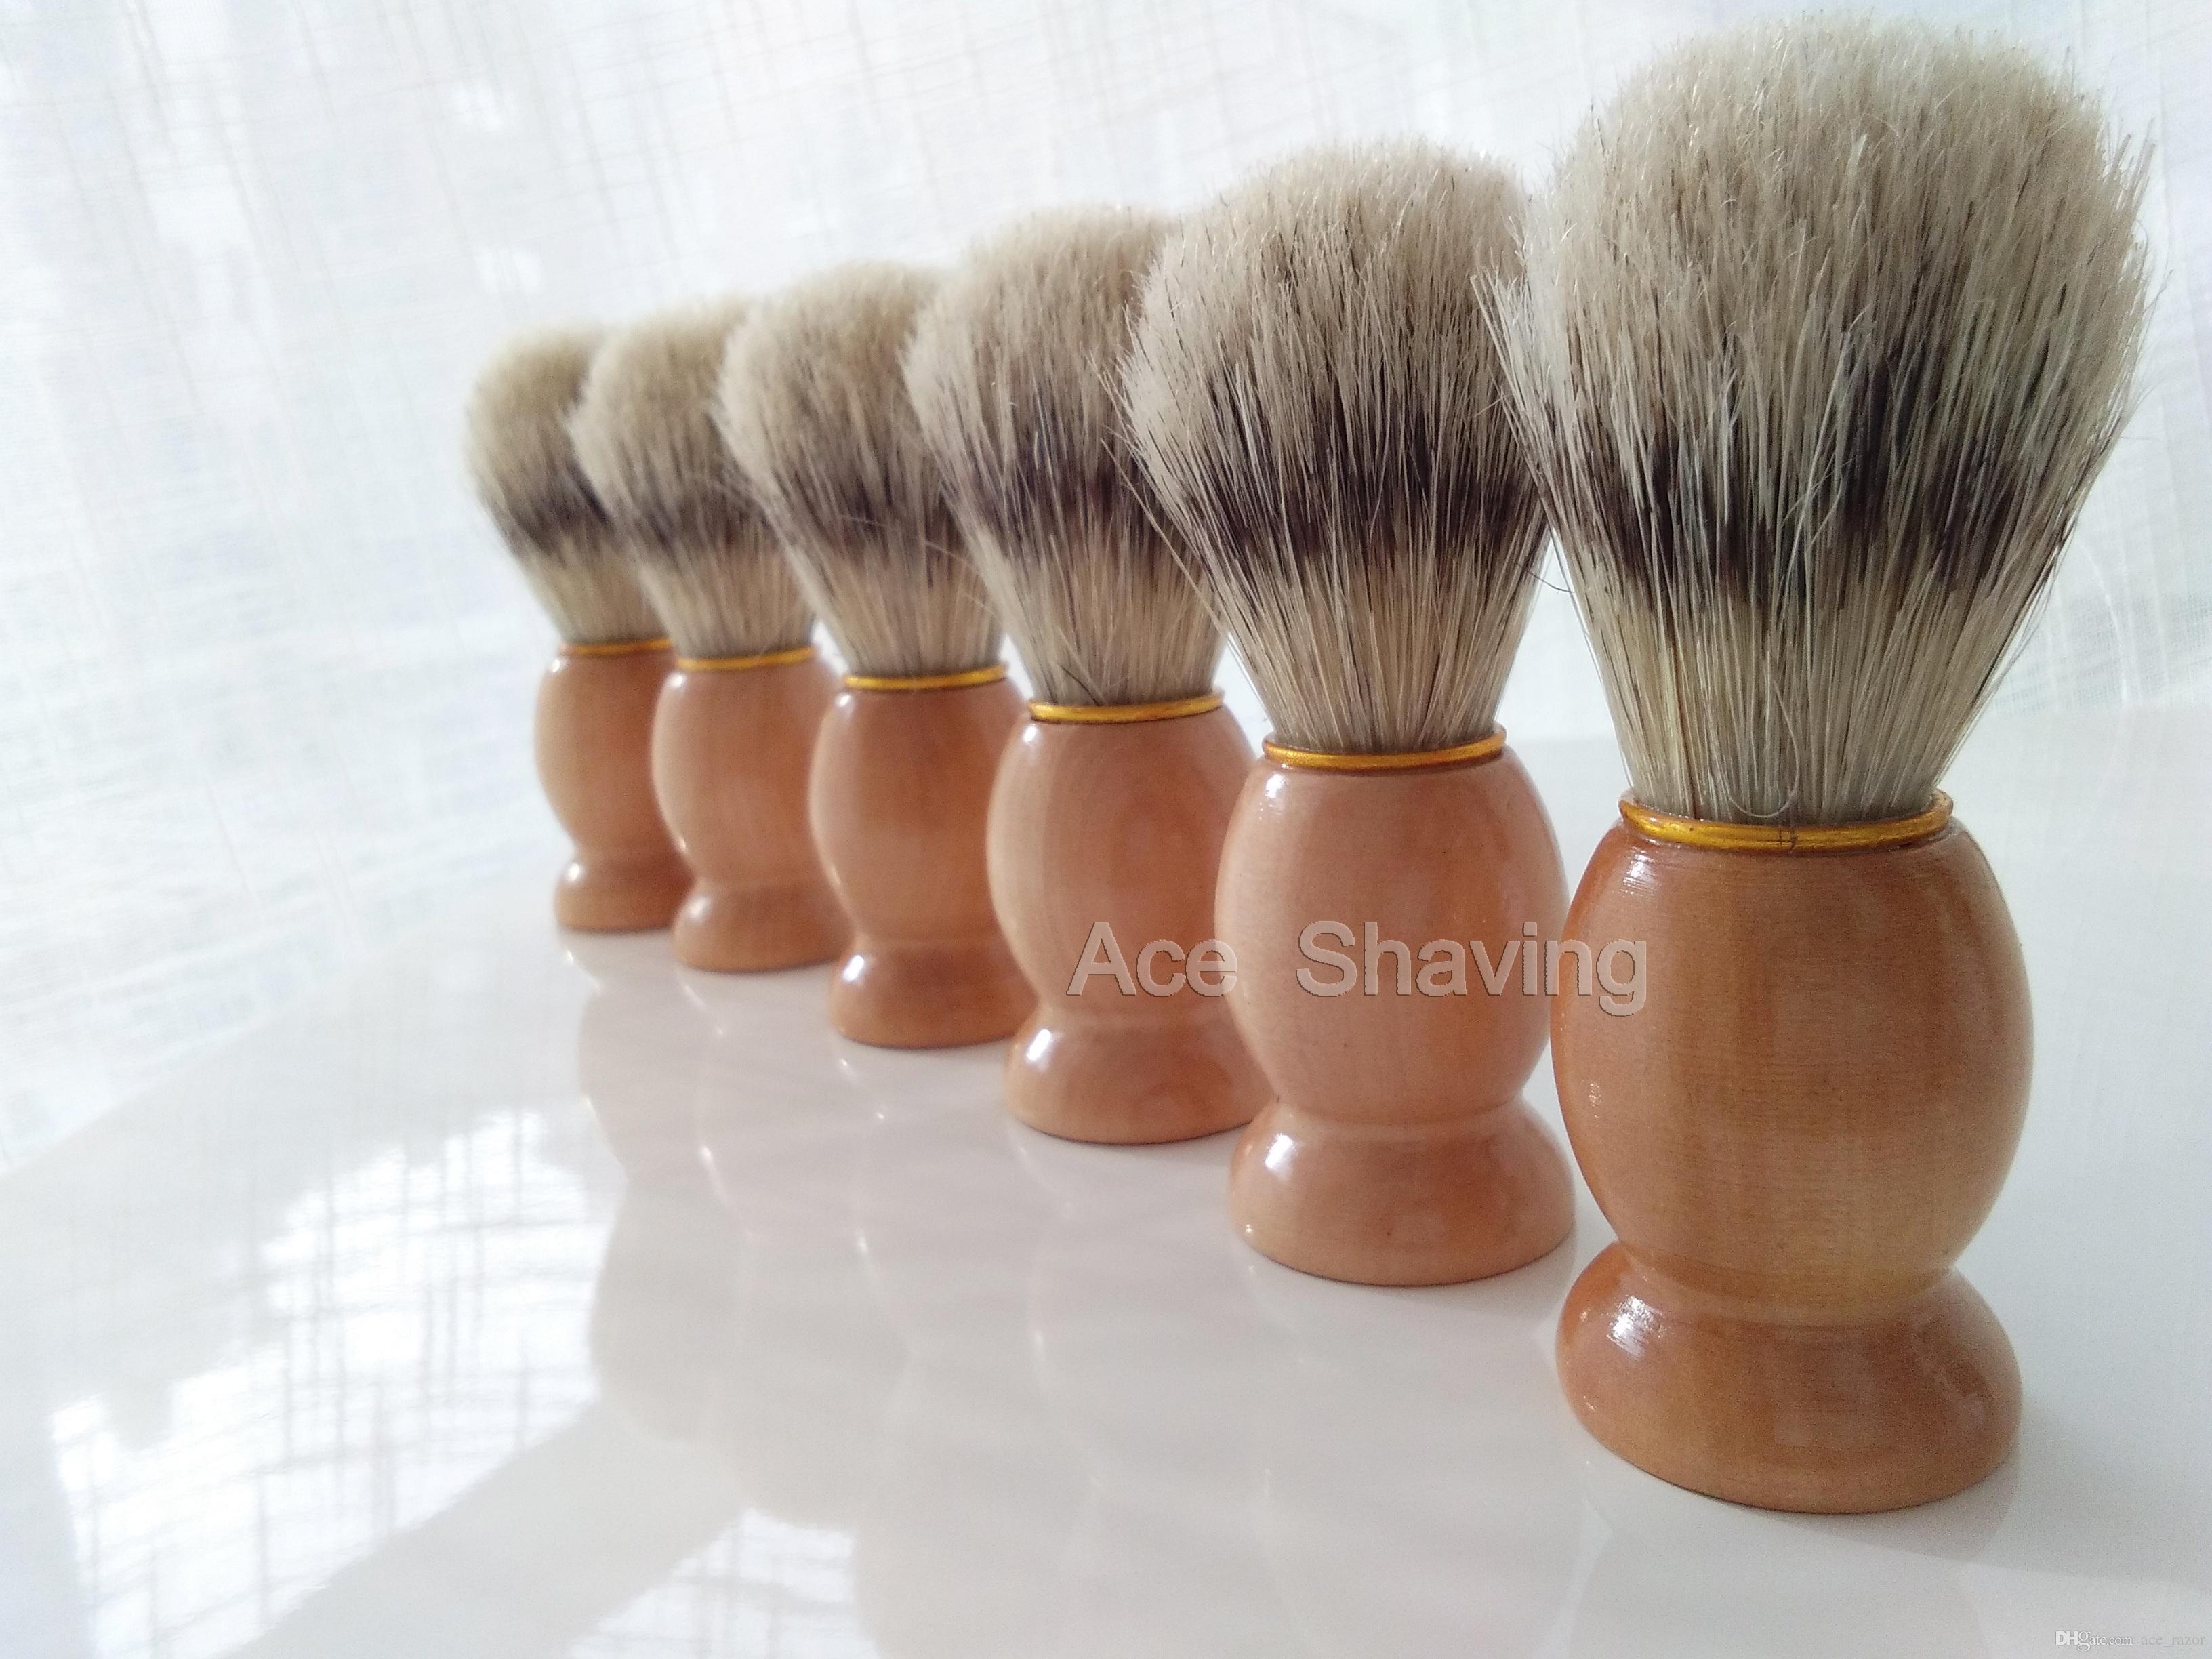 of Faux Badger Color Boar Bristle Hair Wooden Handle Shaving Brush Beard Shaver